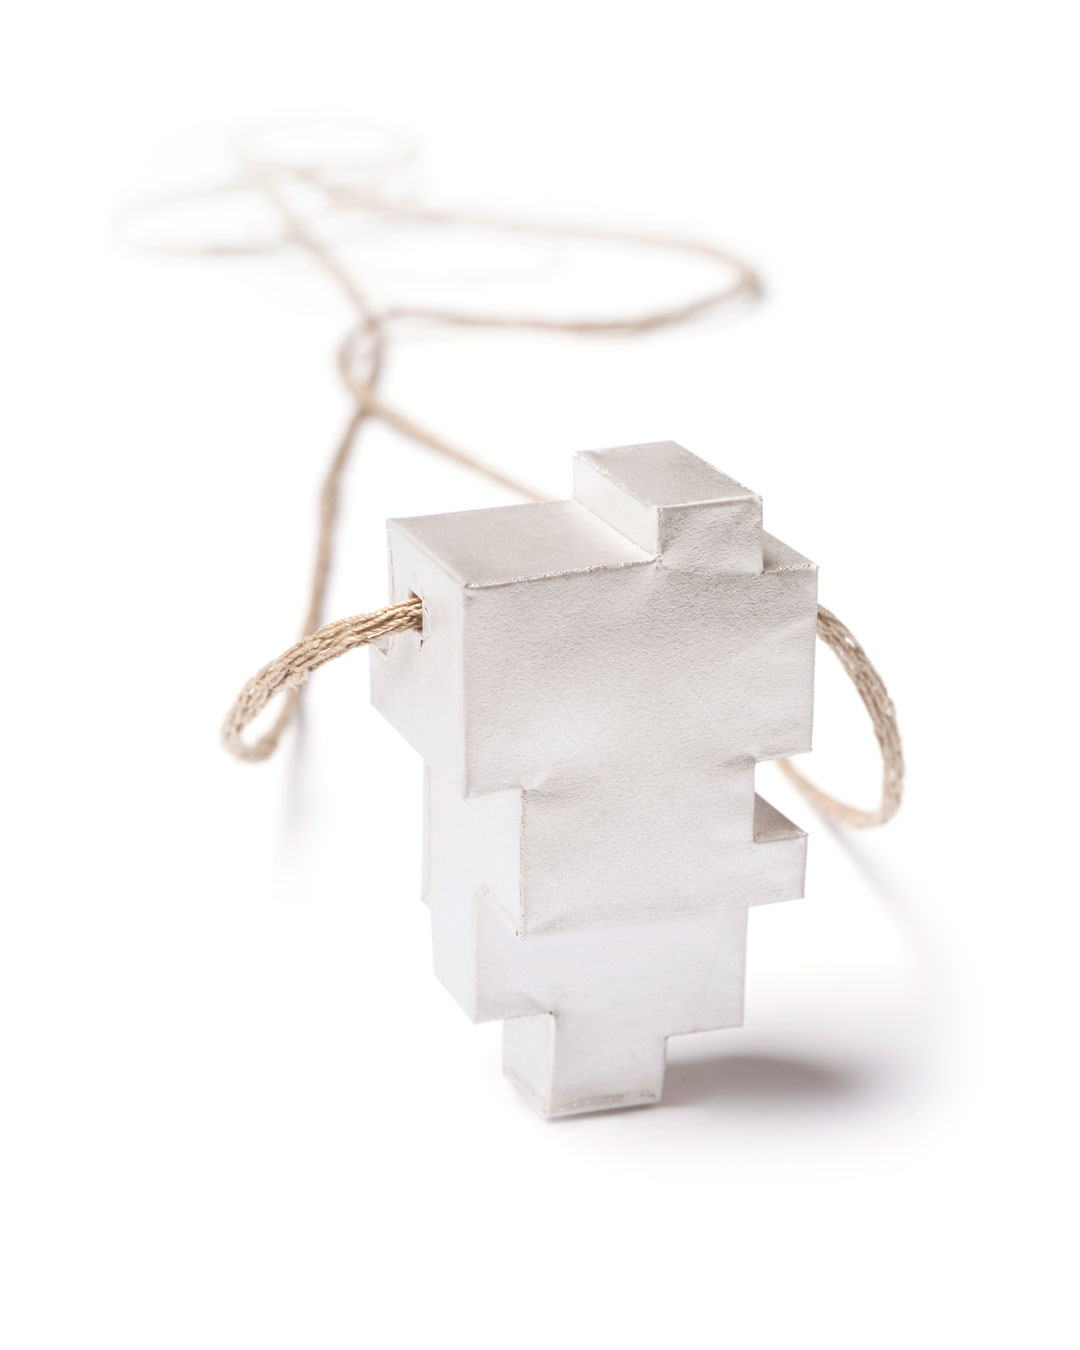 Carla Nuis, Unfurl 2, 2018, pendant; fine silver, linen, 57 x 30 x 21 mm, €710